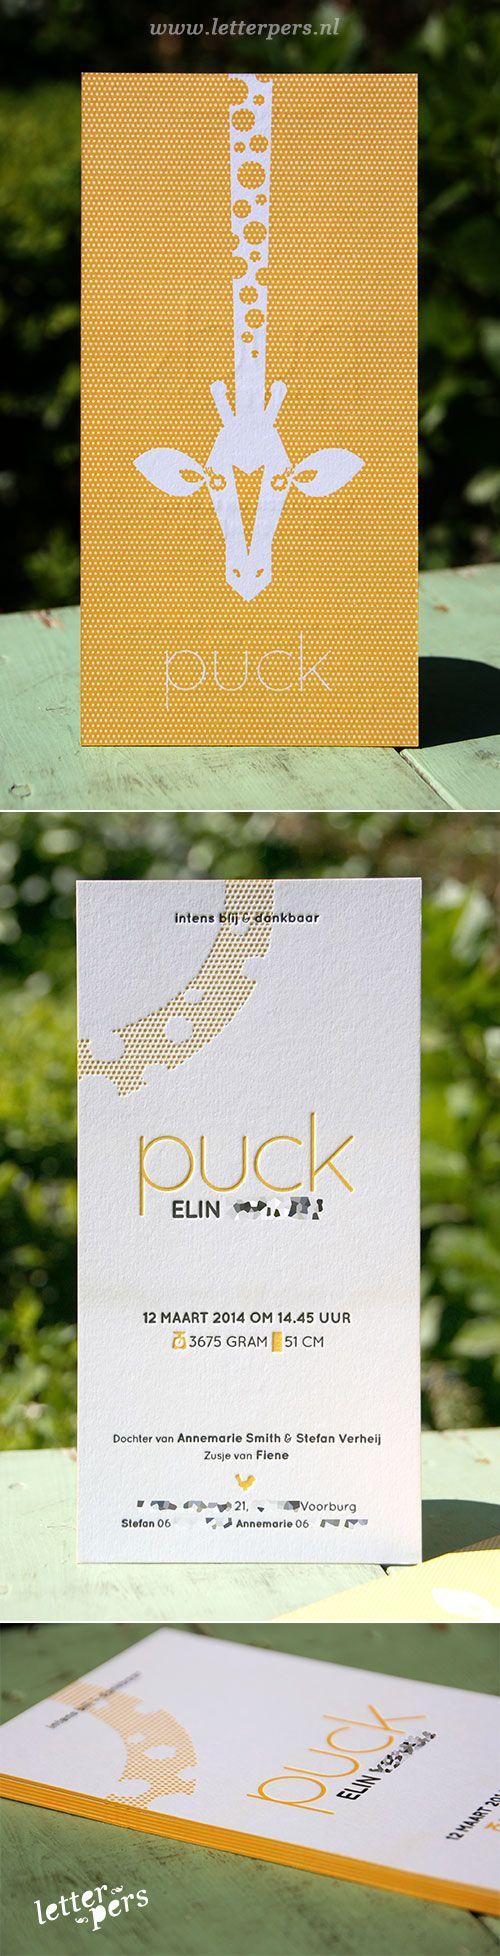 letterpers_letterpress_geboortekaartje_-puck_geel_polkadot_stippen_giraf_vrolijk